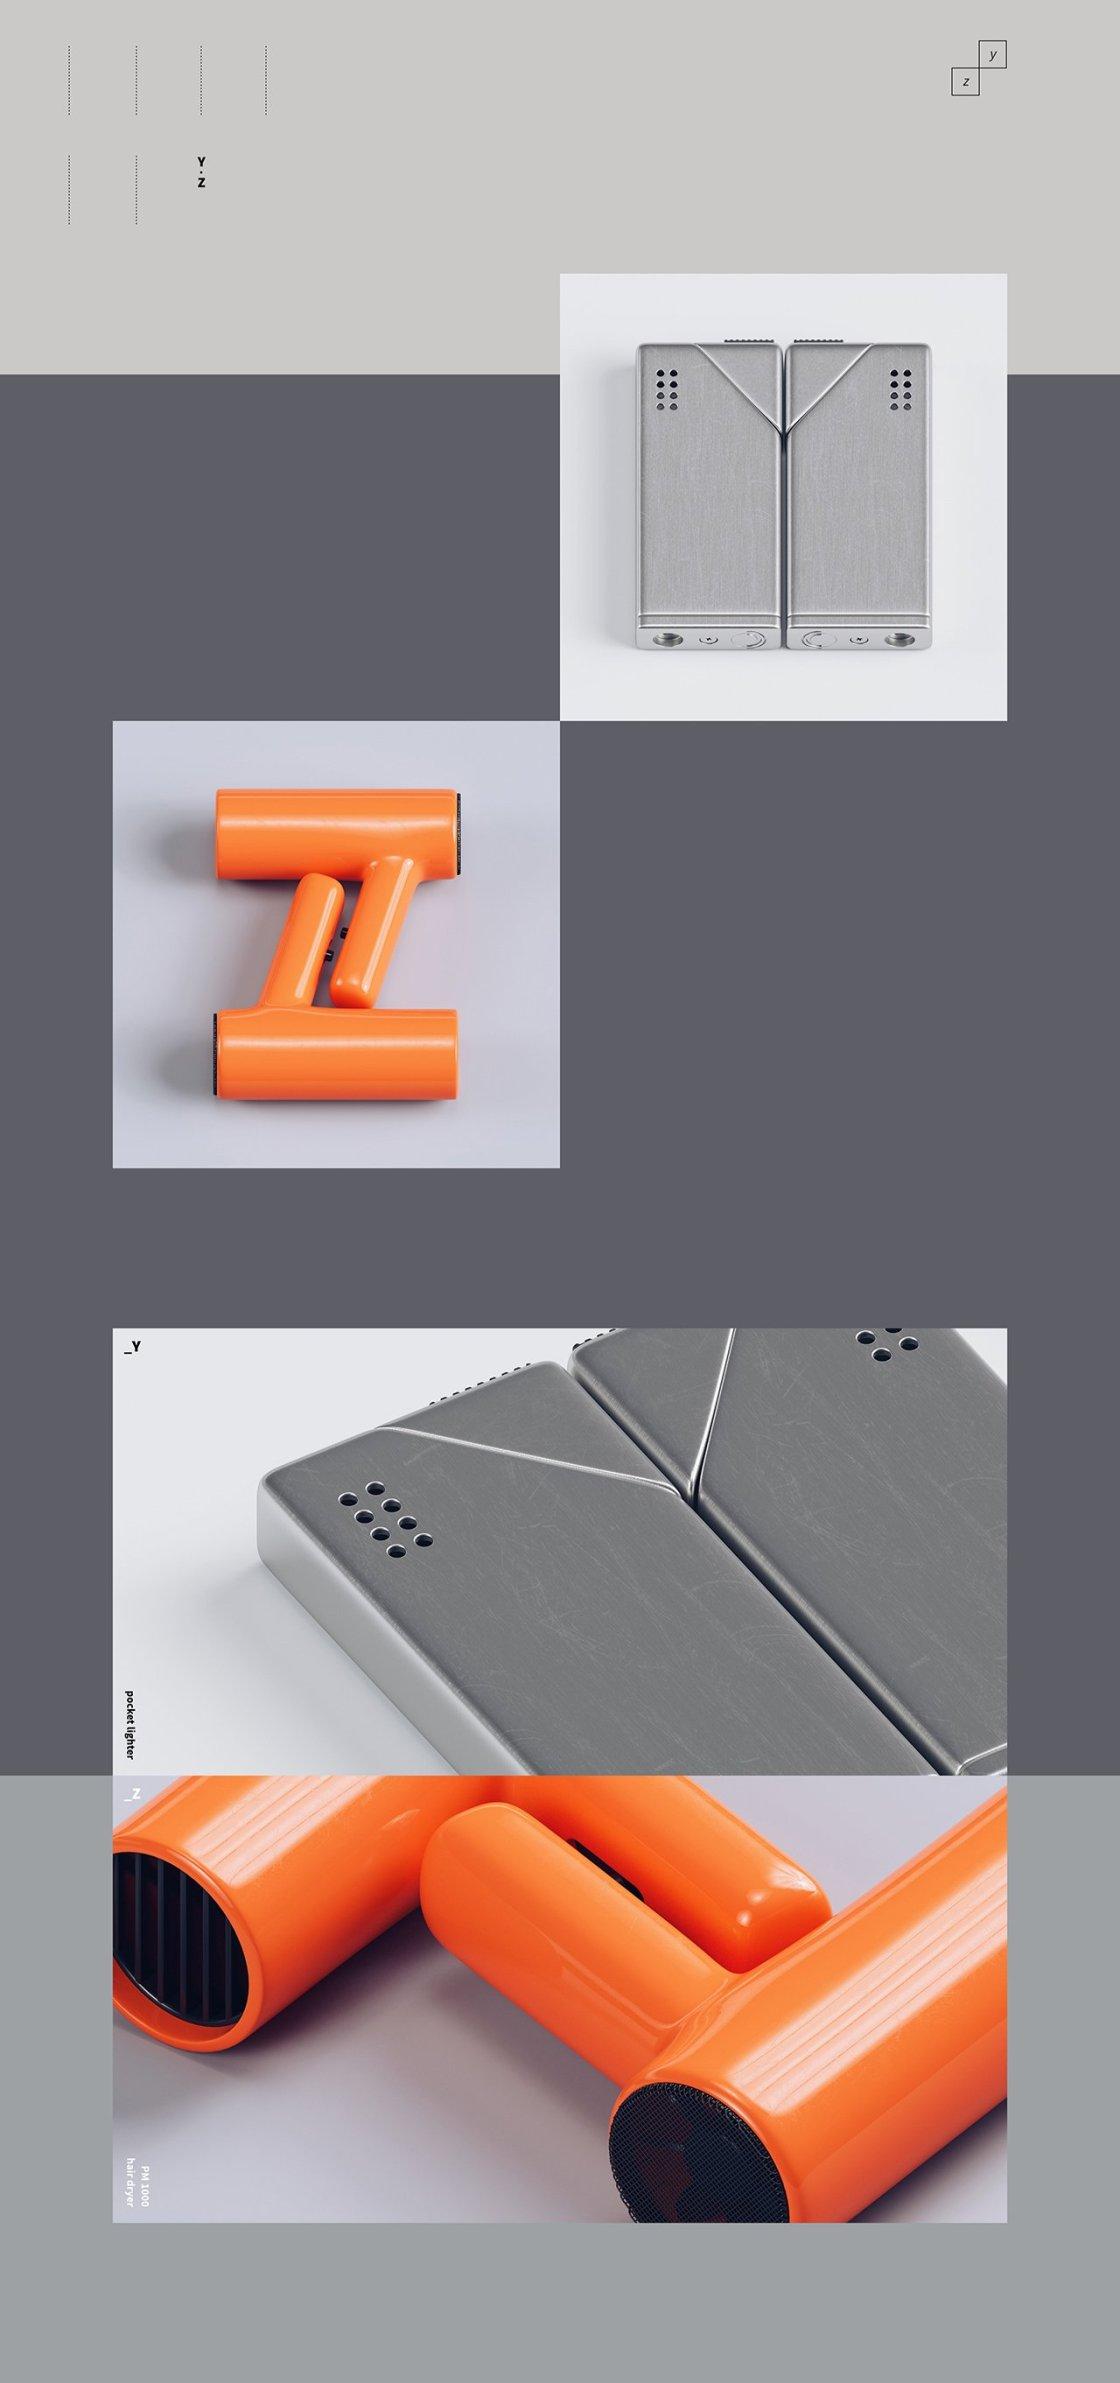 L'alfabeto che nasce dal design di Dieter Rams per Braun